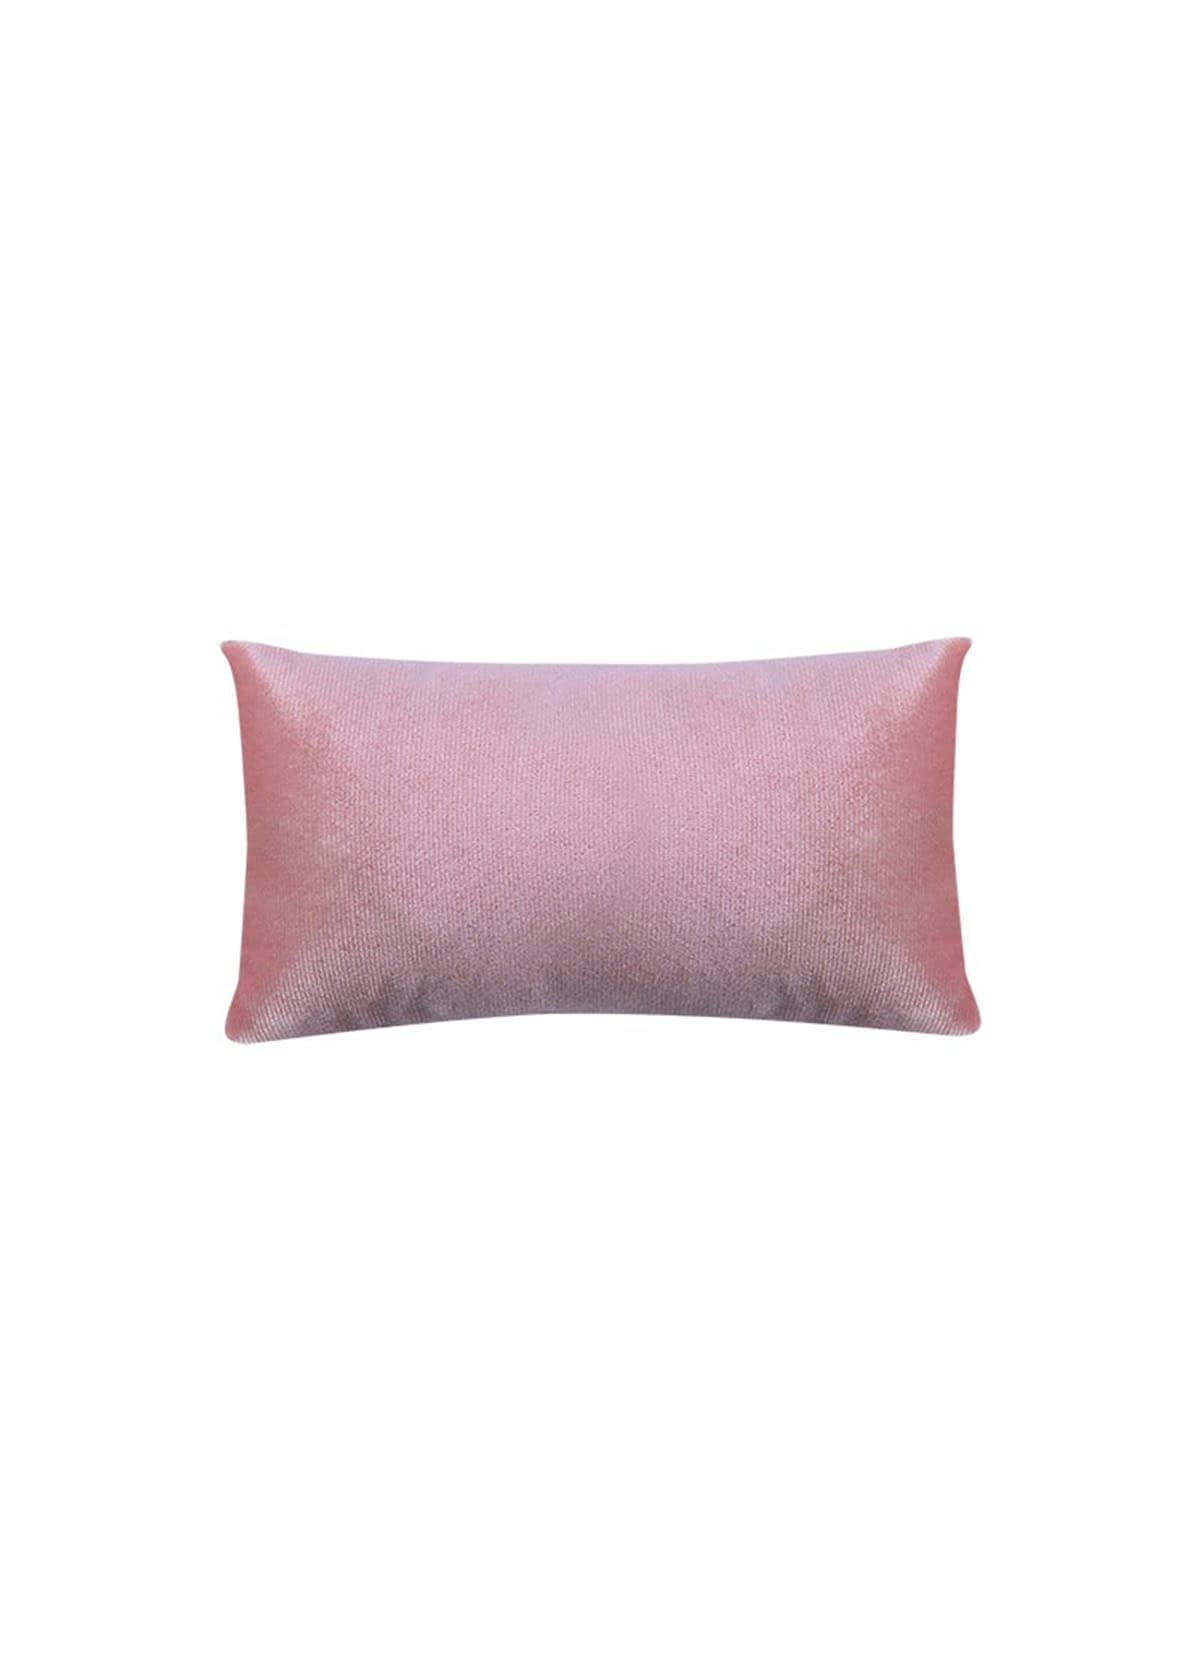 Armbanden kussentje roze